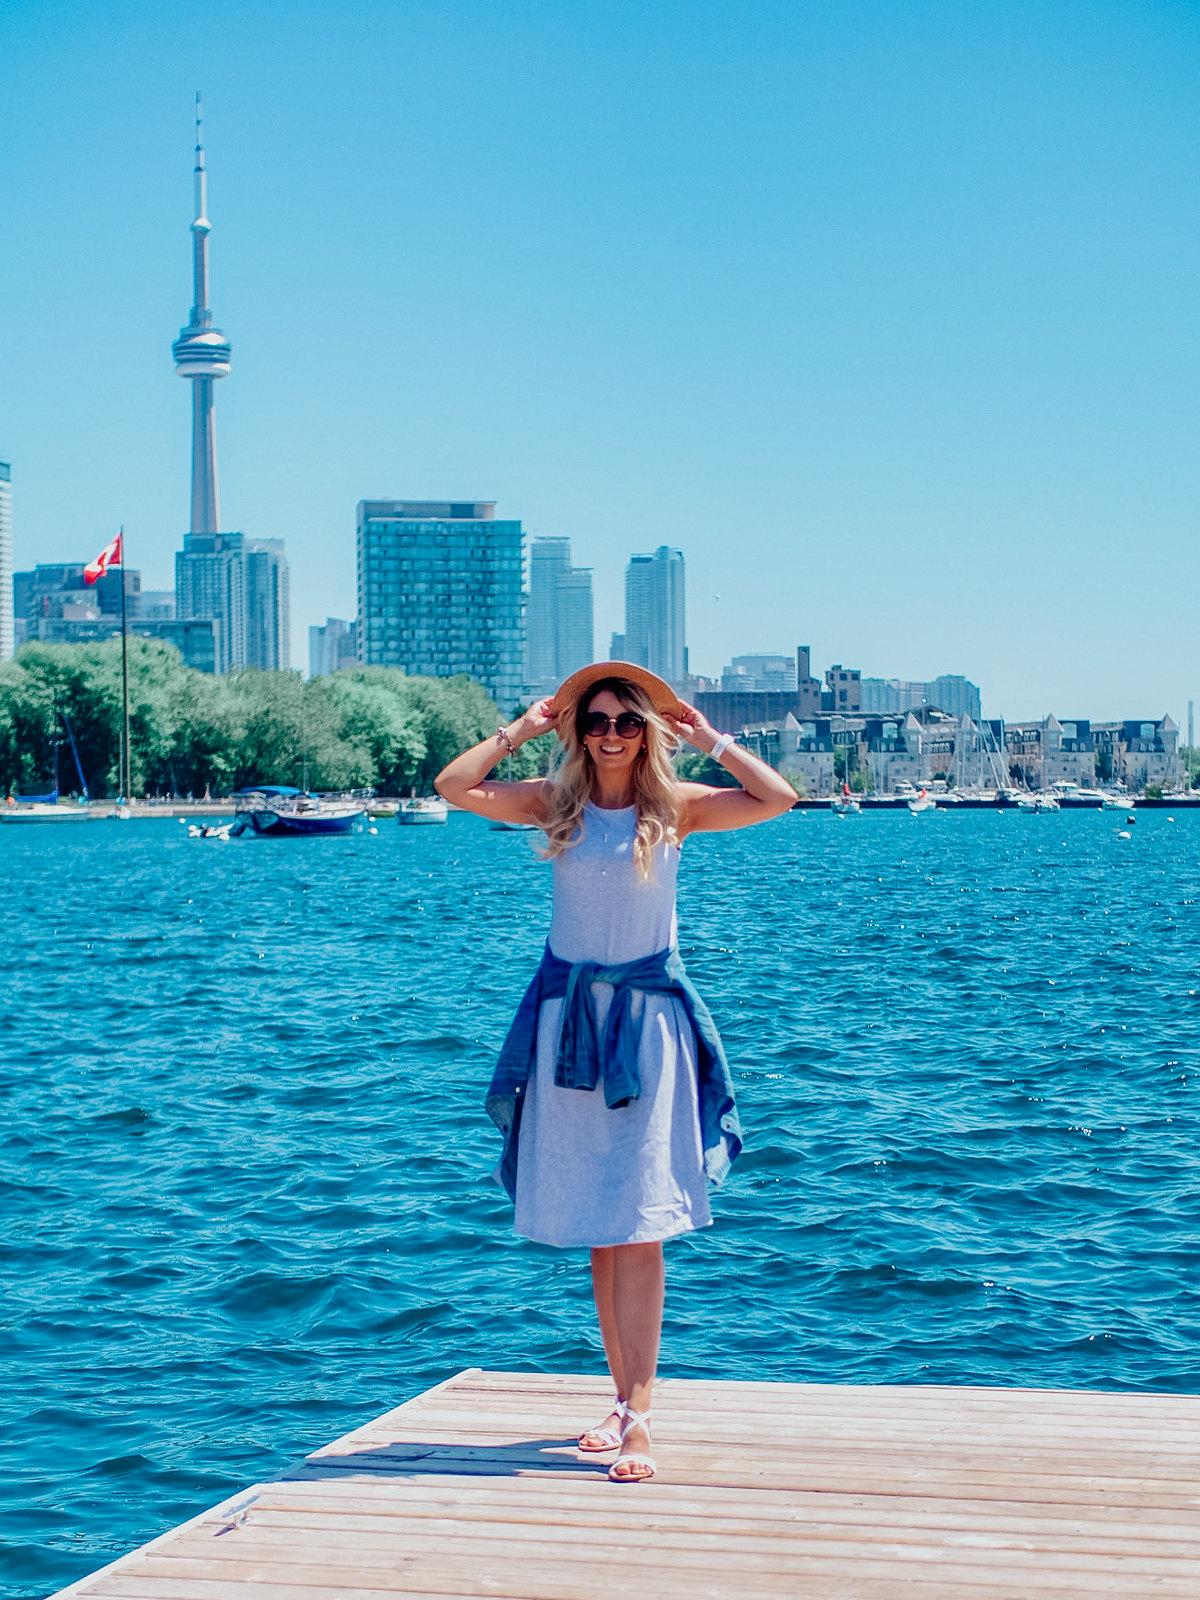 Summer in Toronto